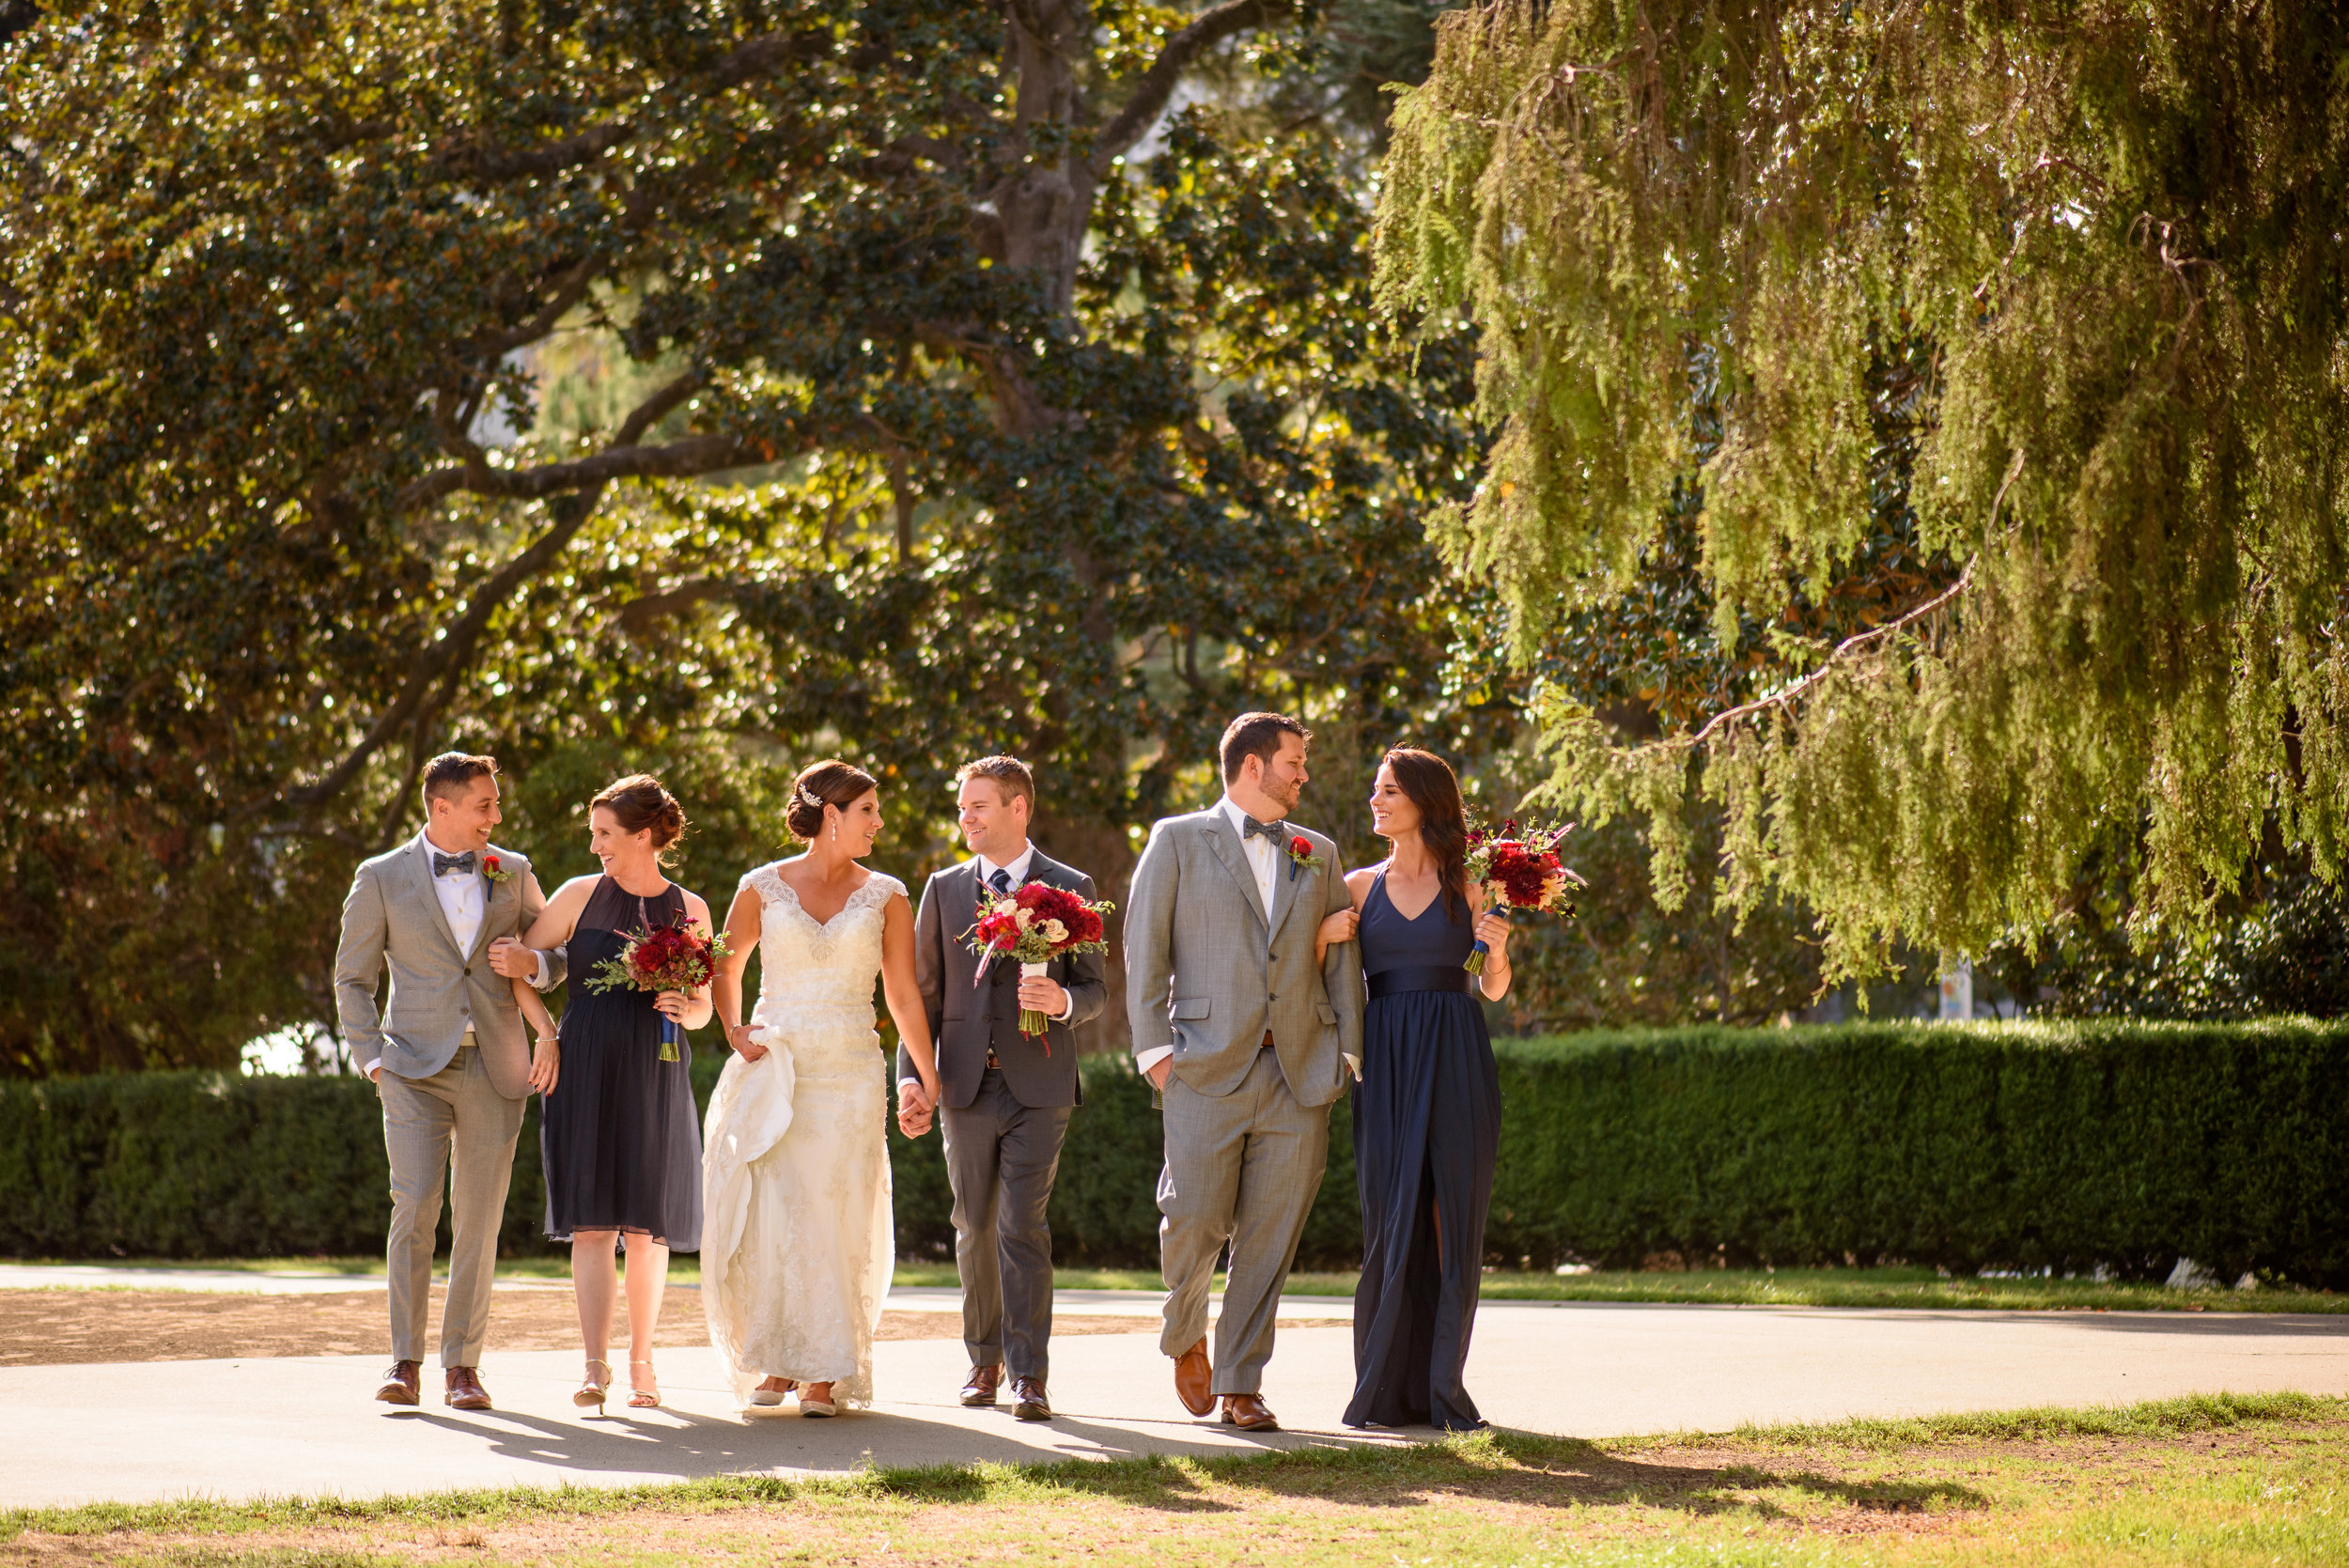 annie-brian-016-antiquite-midtown-sacramento-wedding-photographer-katherine-nicole-photography.JPG